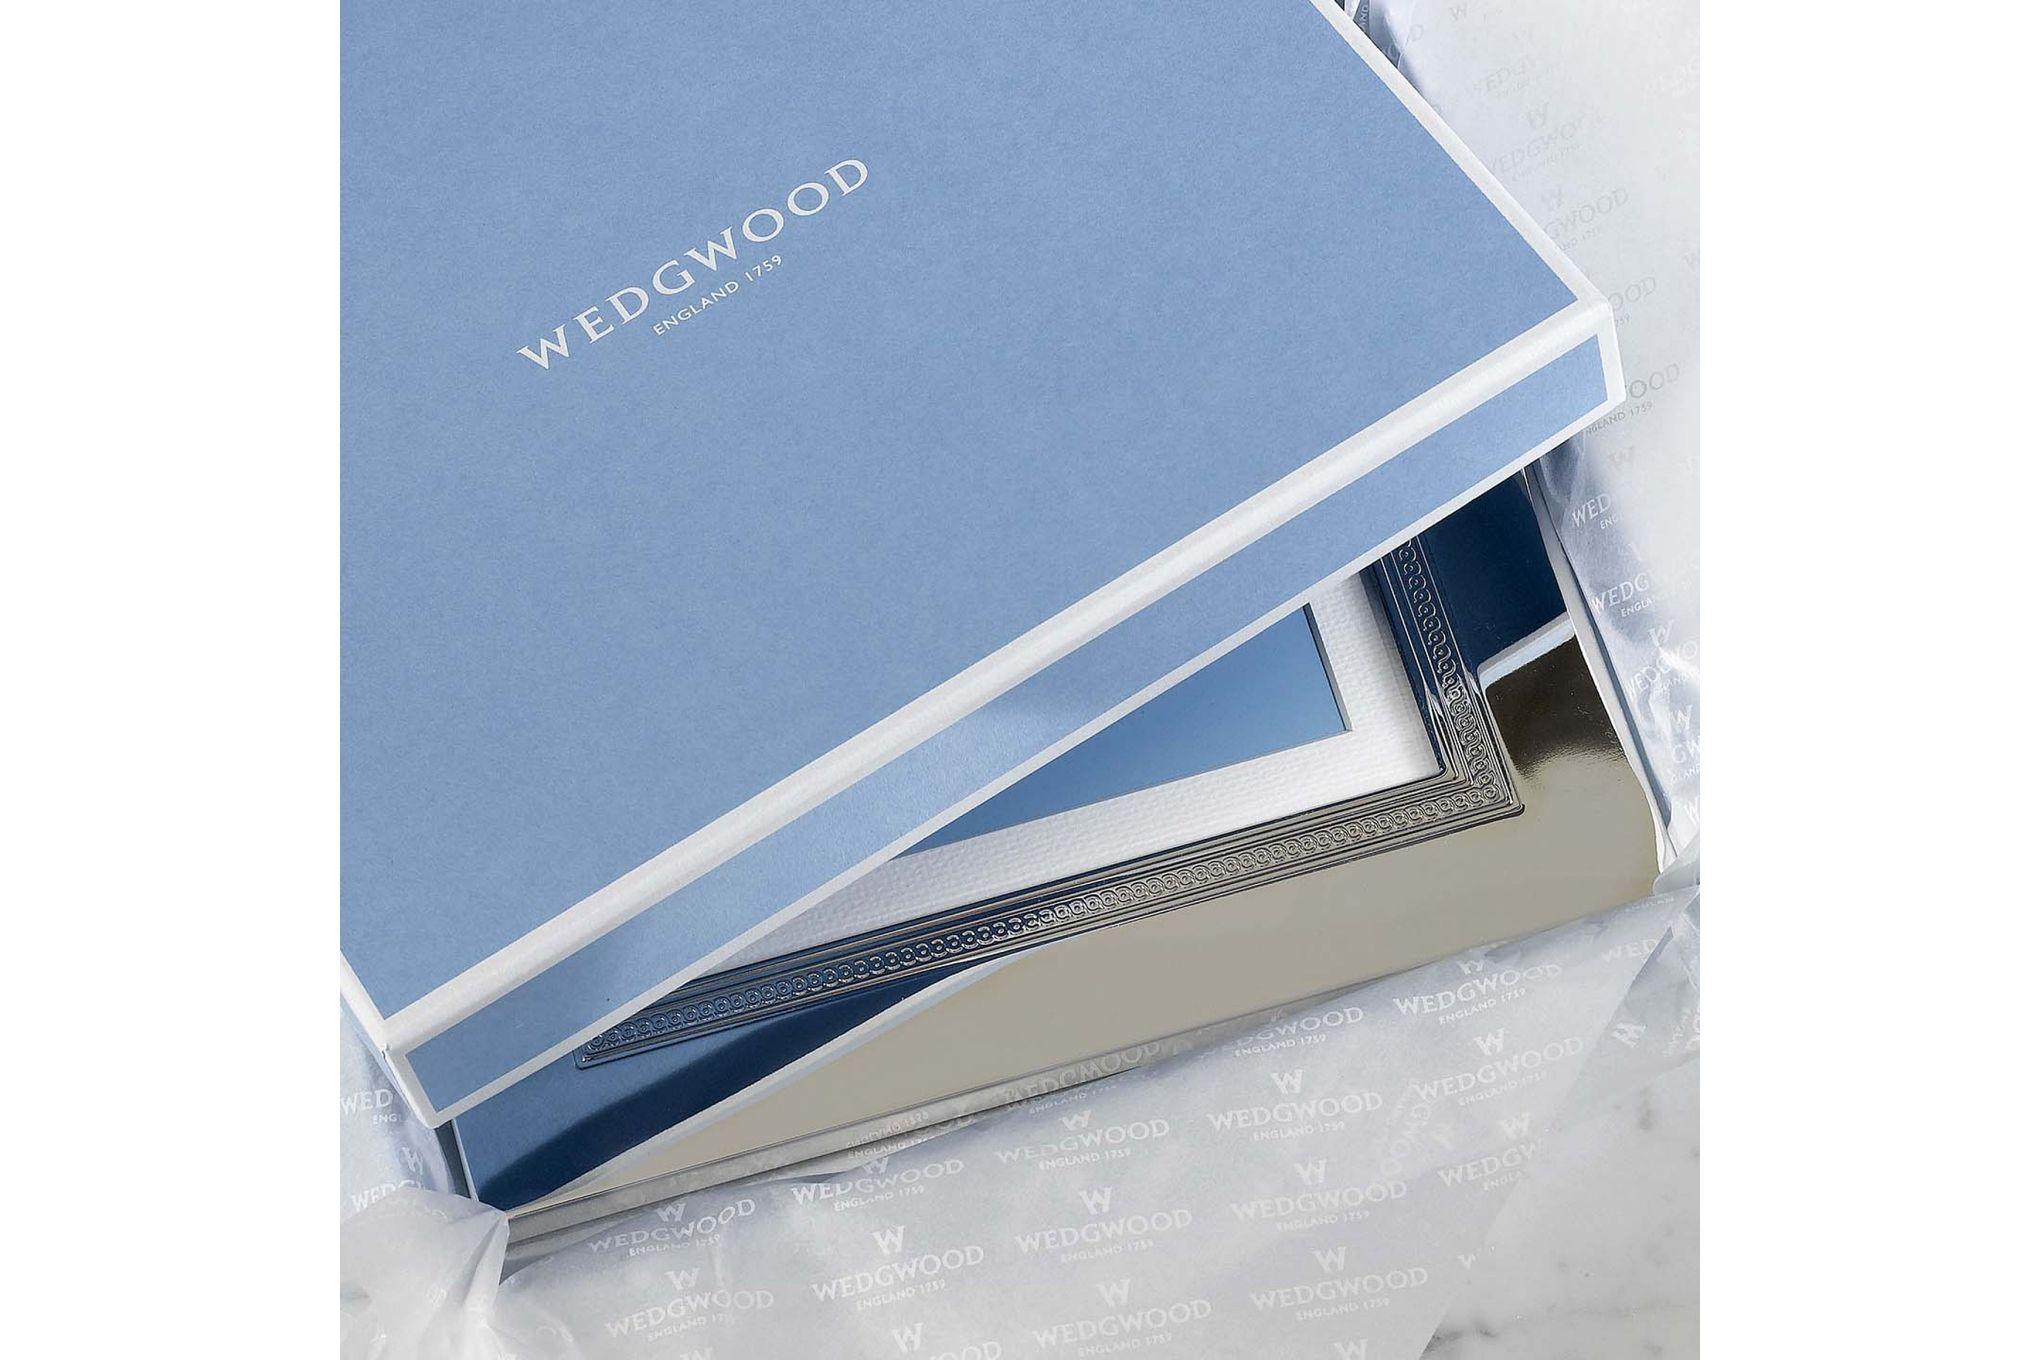 "Wedgwood Simply Wish Photo Frame Double 13 x 7"" thumb 2"